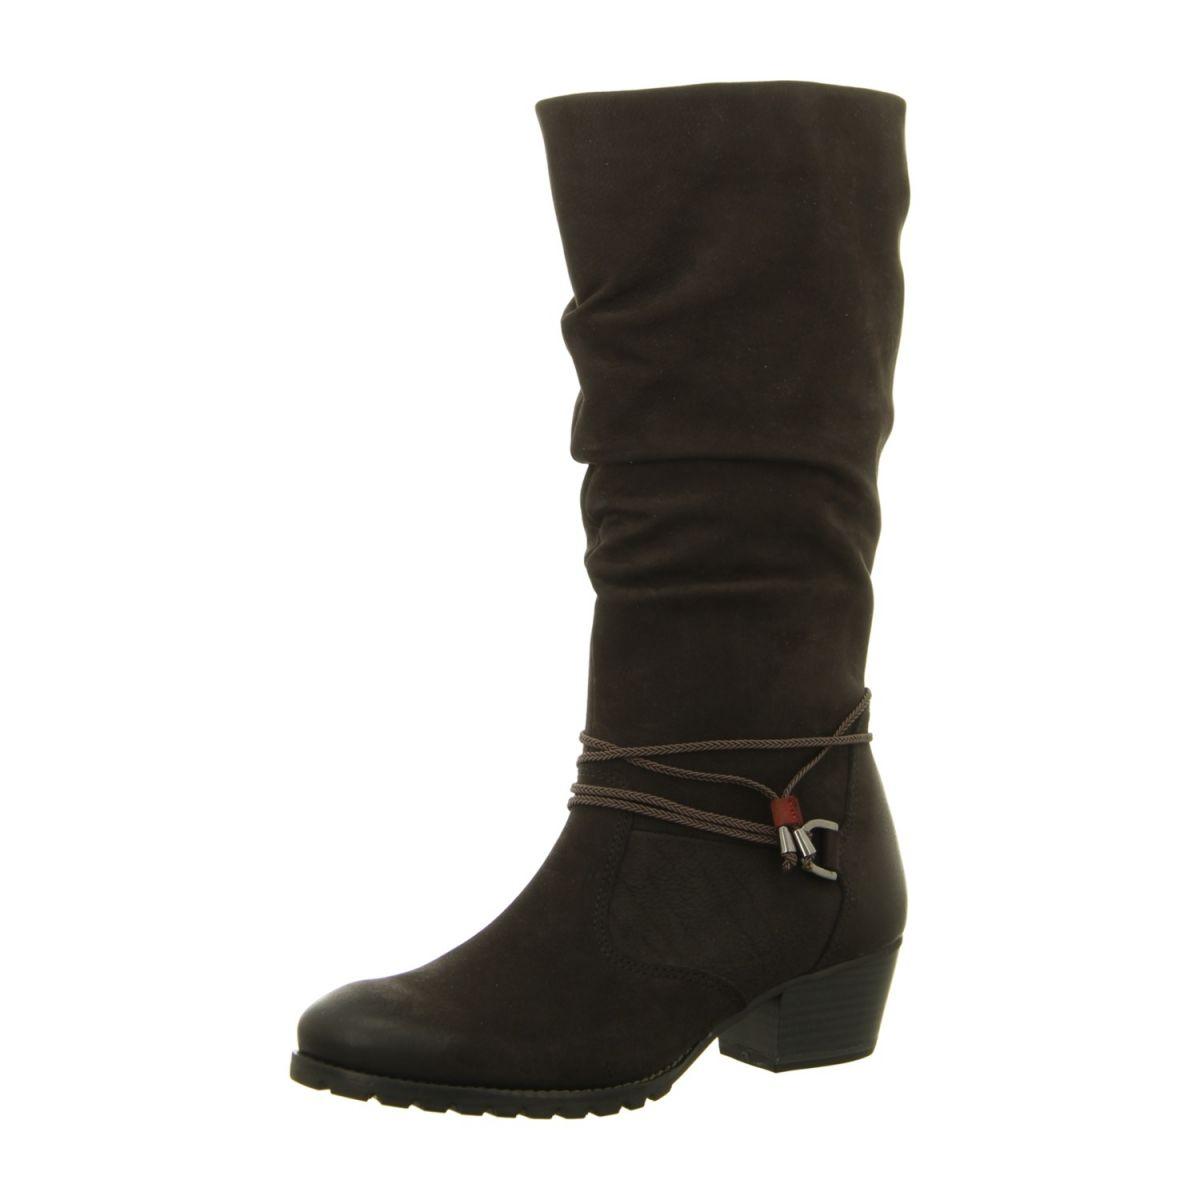 NEU: Tamaris Stiefel 1 1 25531 27 001 black | Schuhe